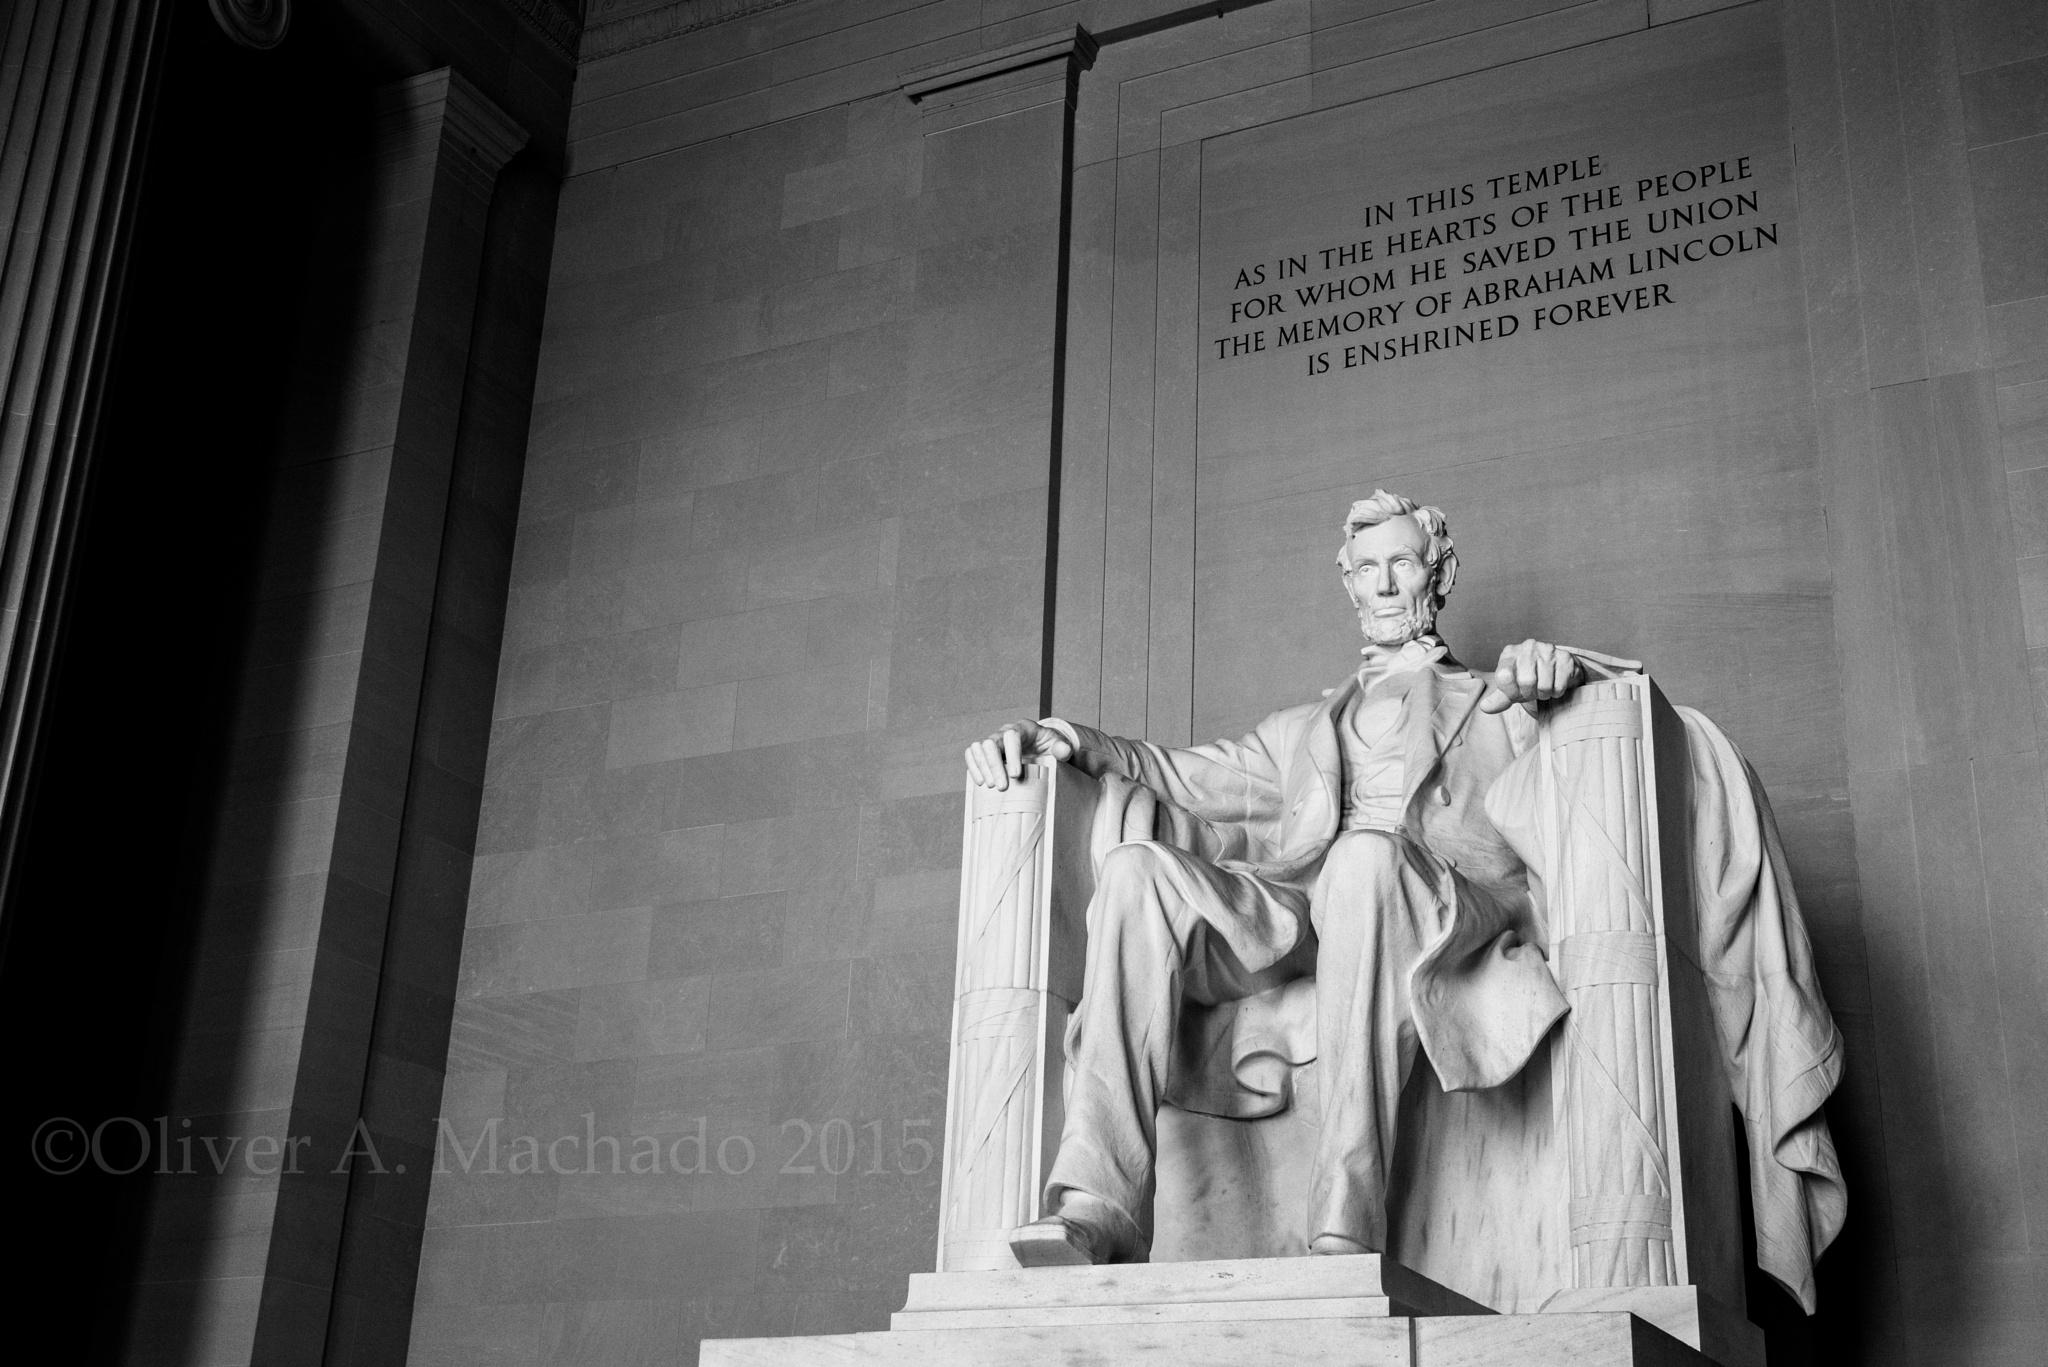 Abraham Lincoln Memorial by Oliver Machado